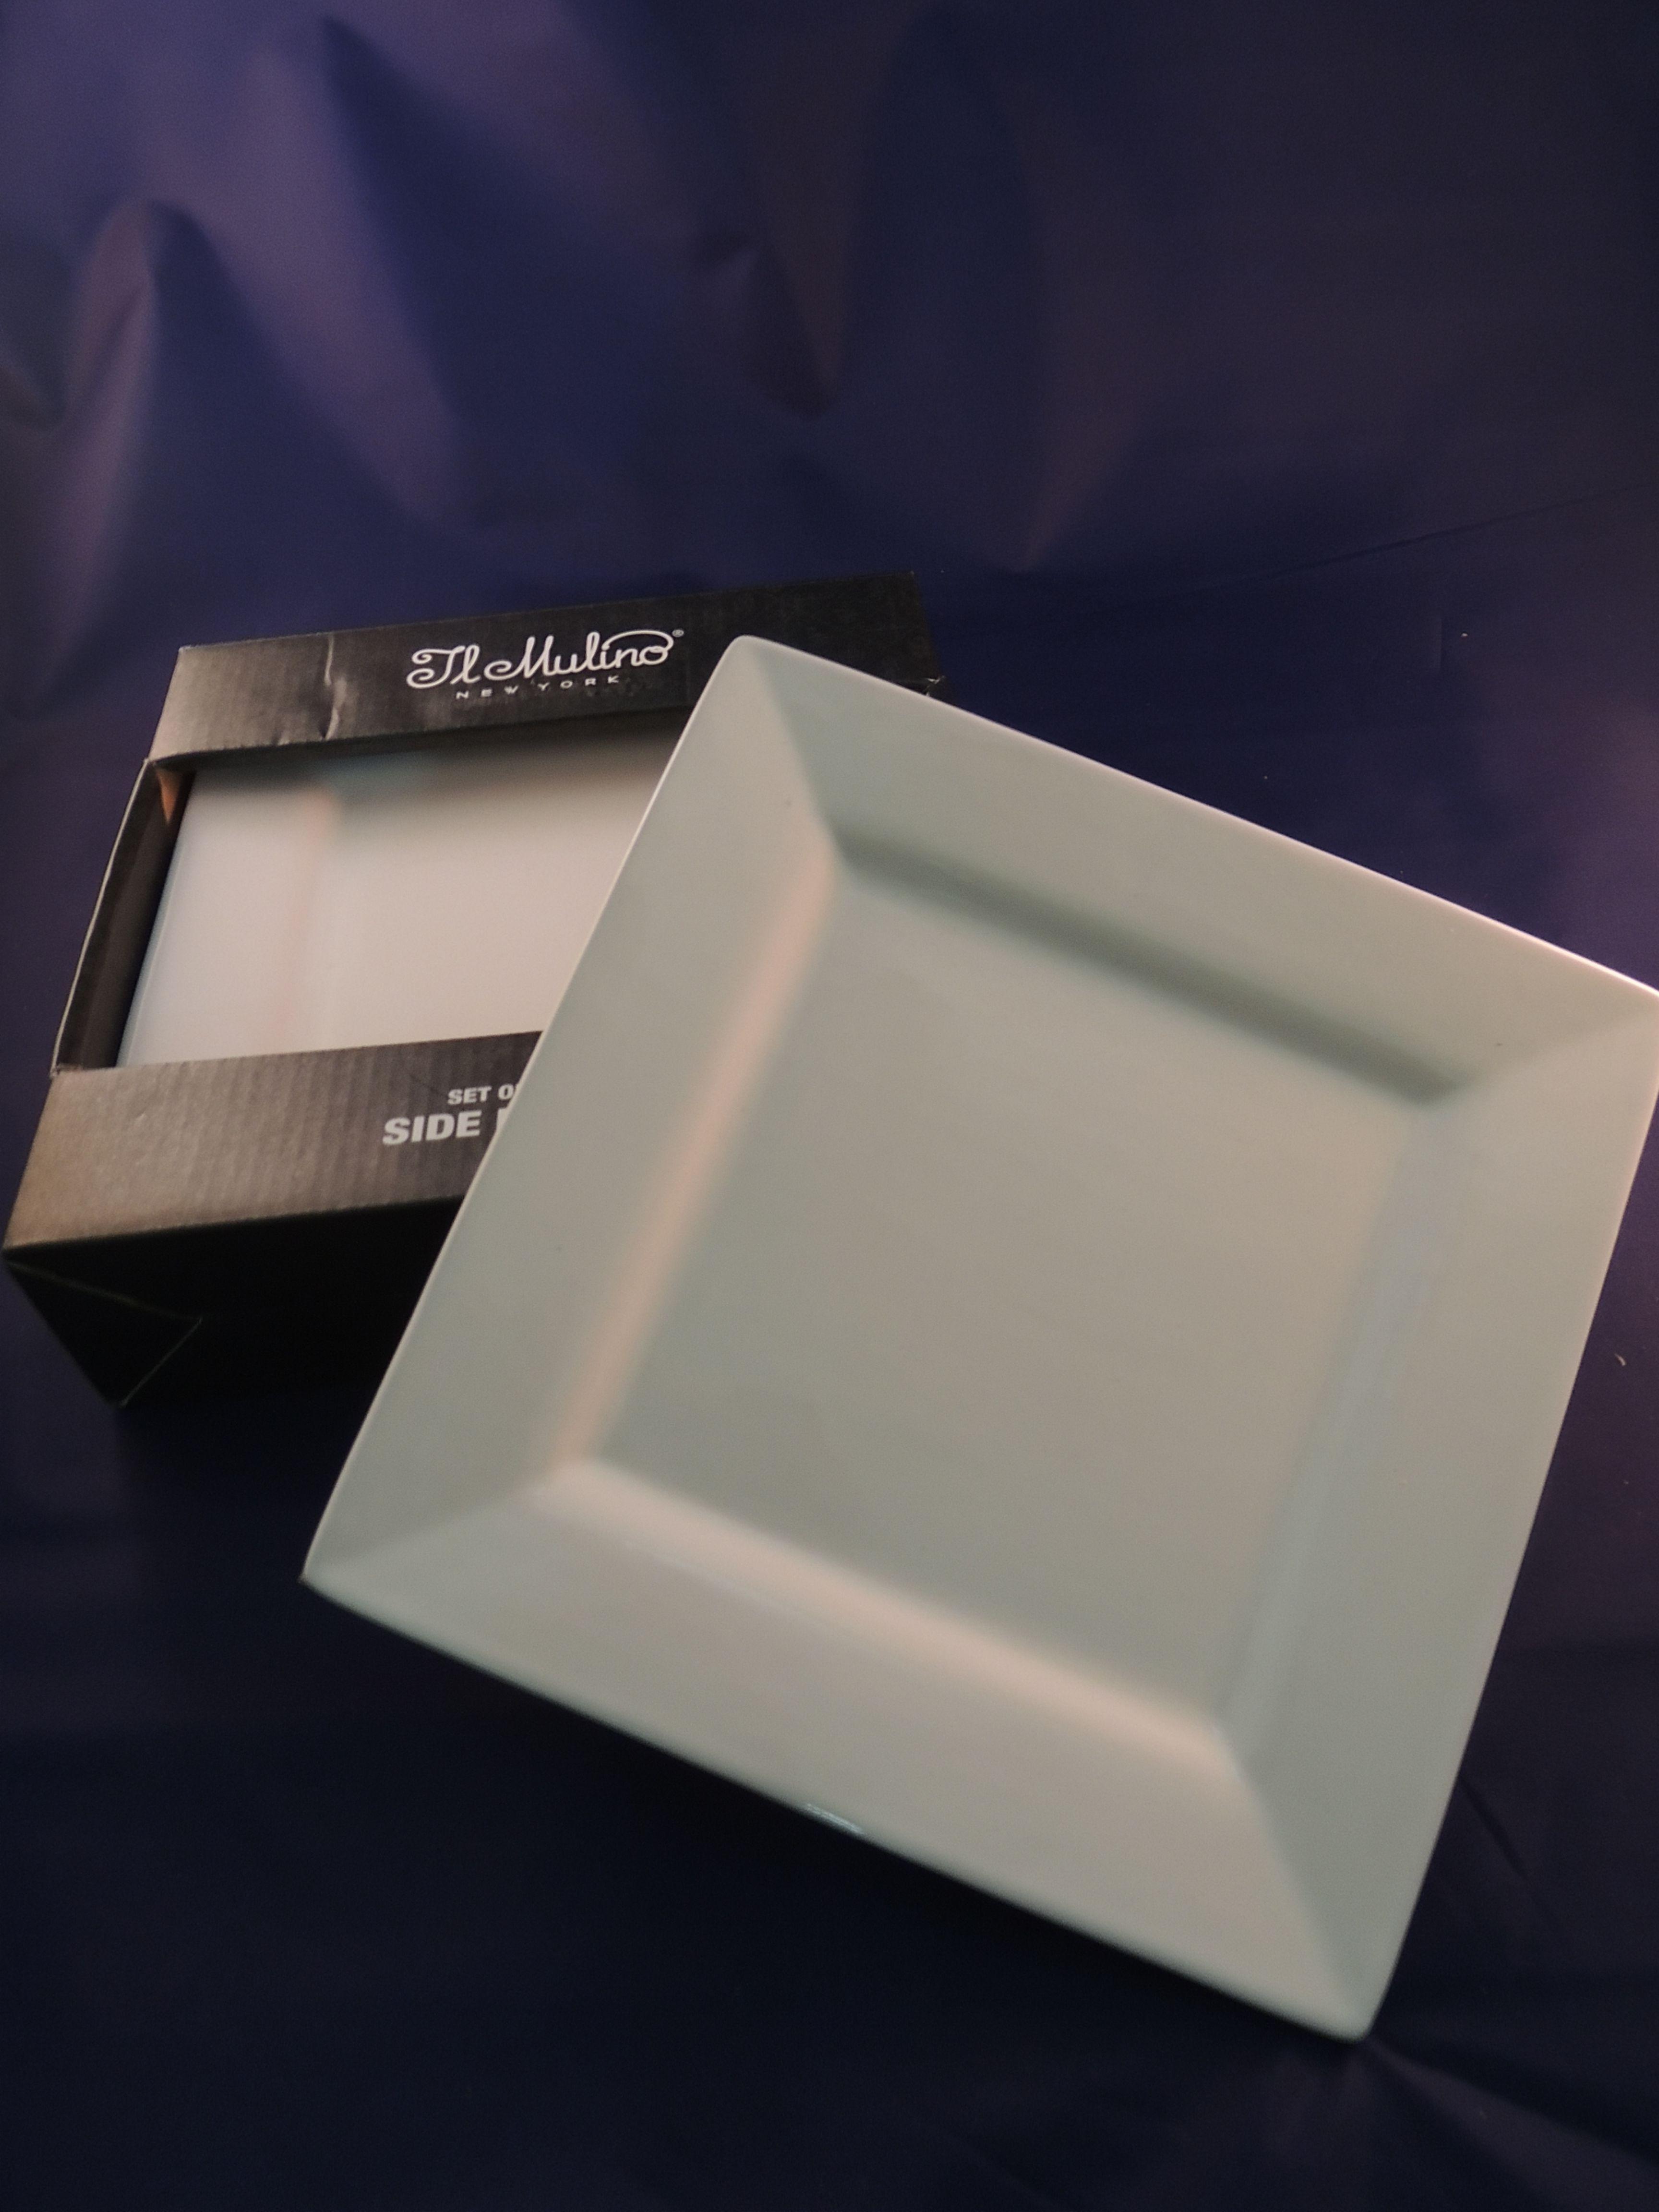 Otros platos cuadrados t j maxx mis utensilios for Platos cuadrados de porcelana